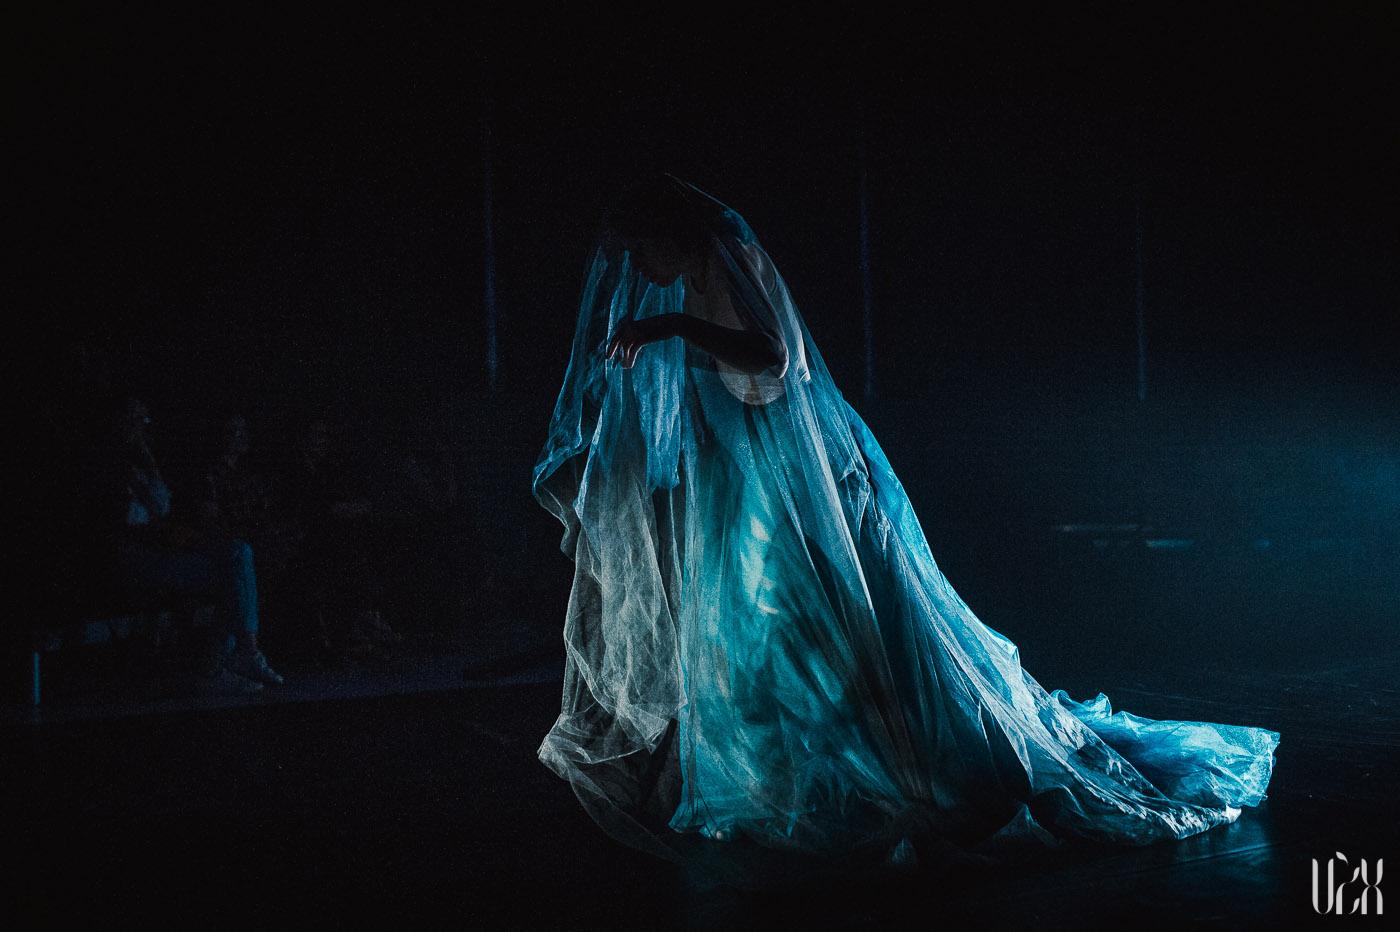 E.sabaliauskaite Vzx.lt Faustas Teatras Event 017